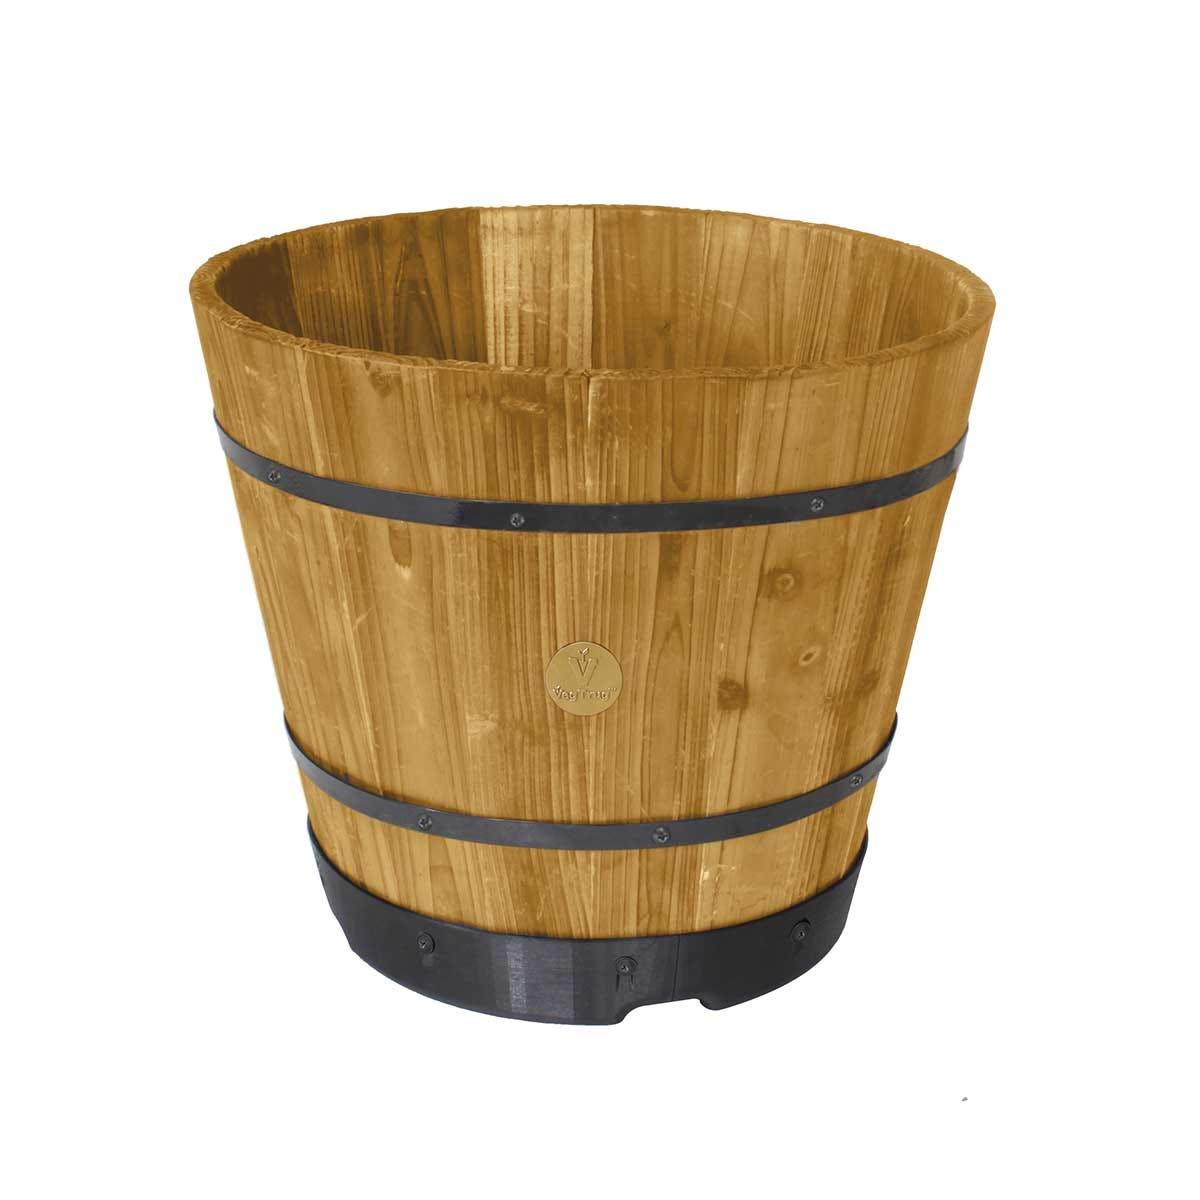 VegTrug Medium 46cm Barrel Planter - Natural